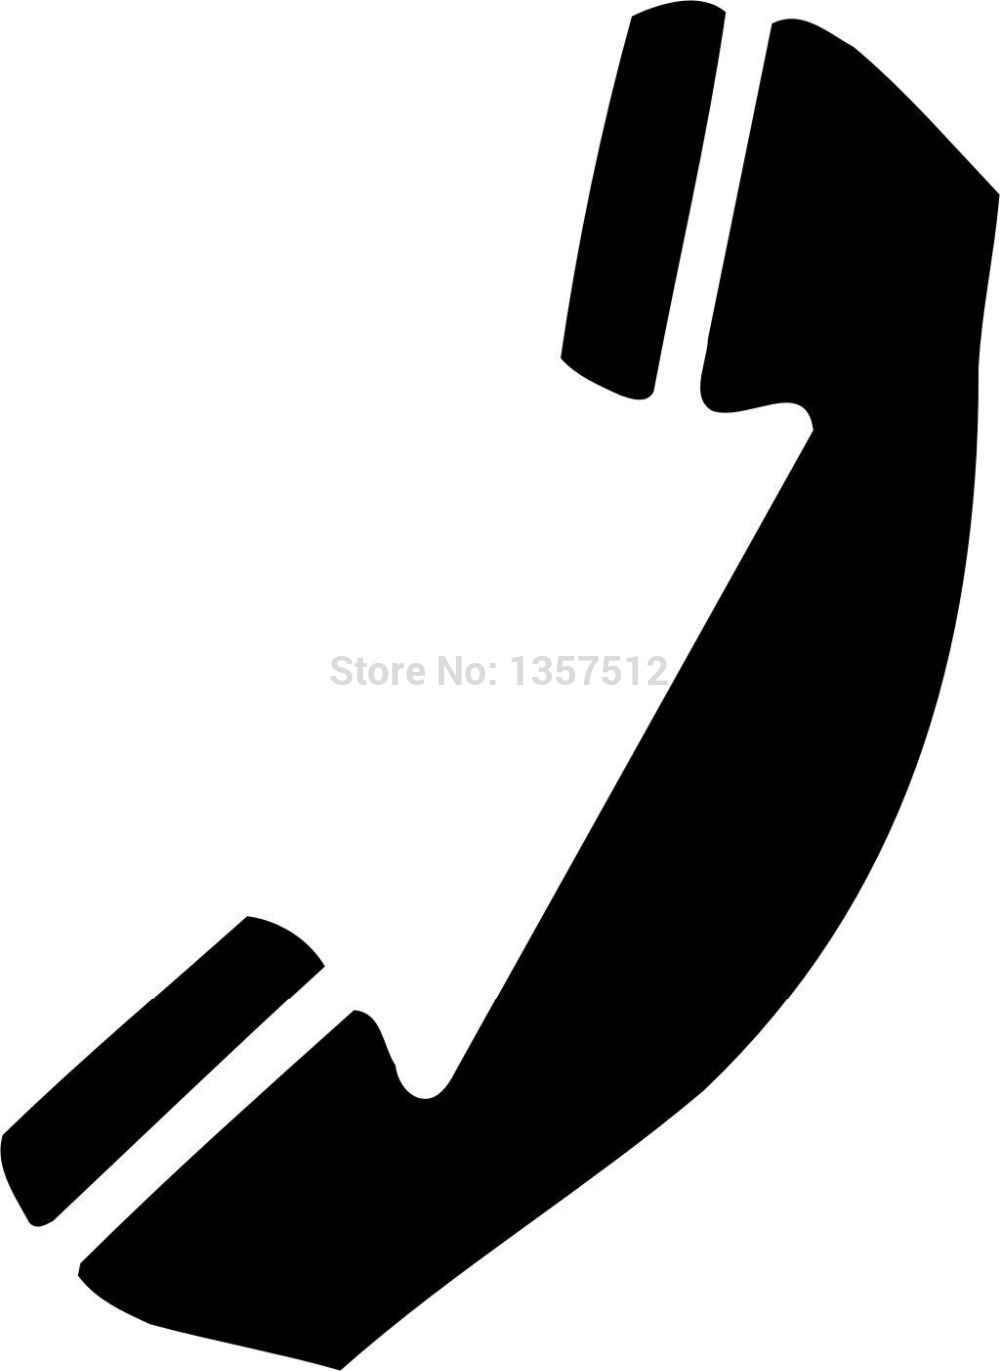 Wholesale 20 pcs/lot Telephone Symbol Car Window Sticker For Truck Bumper Auto SUV Door Kayak Vinyl Decal 8 Colors(China (Mainland))